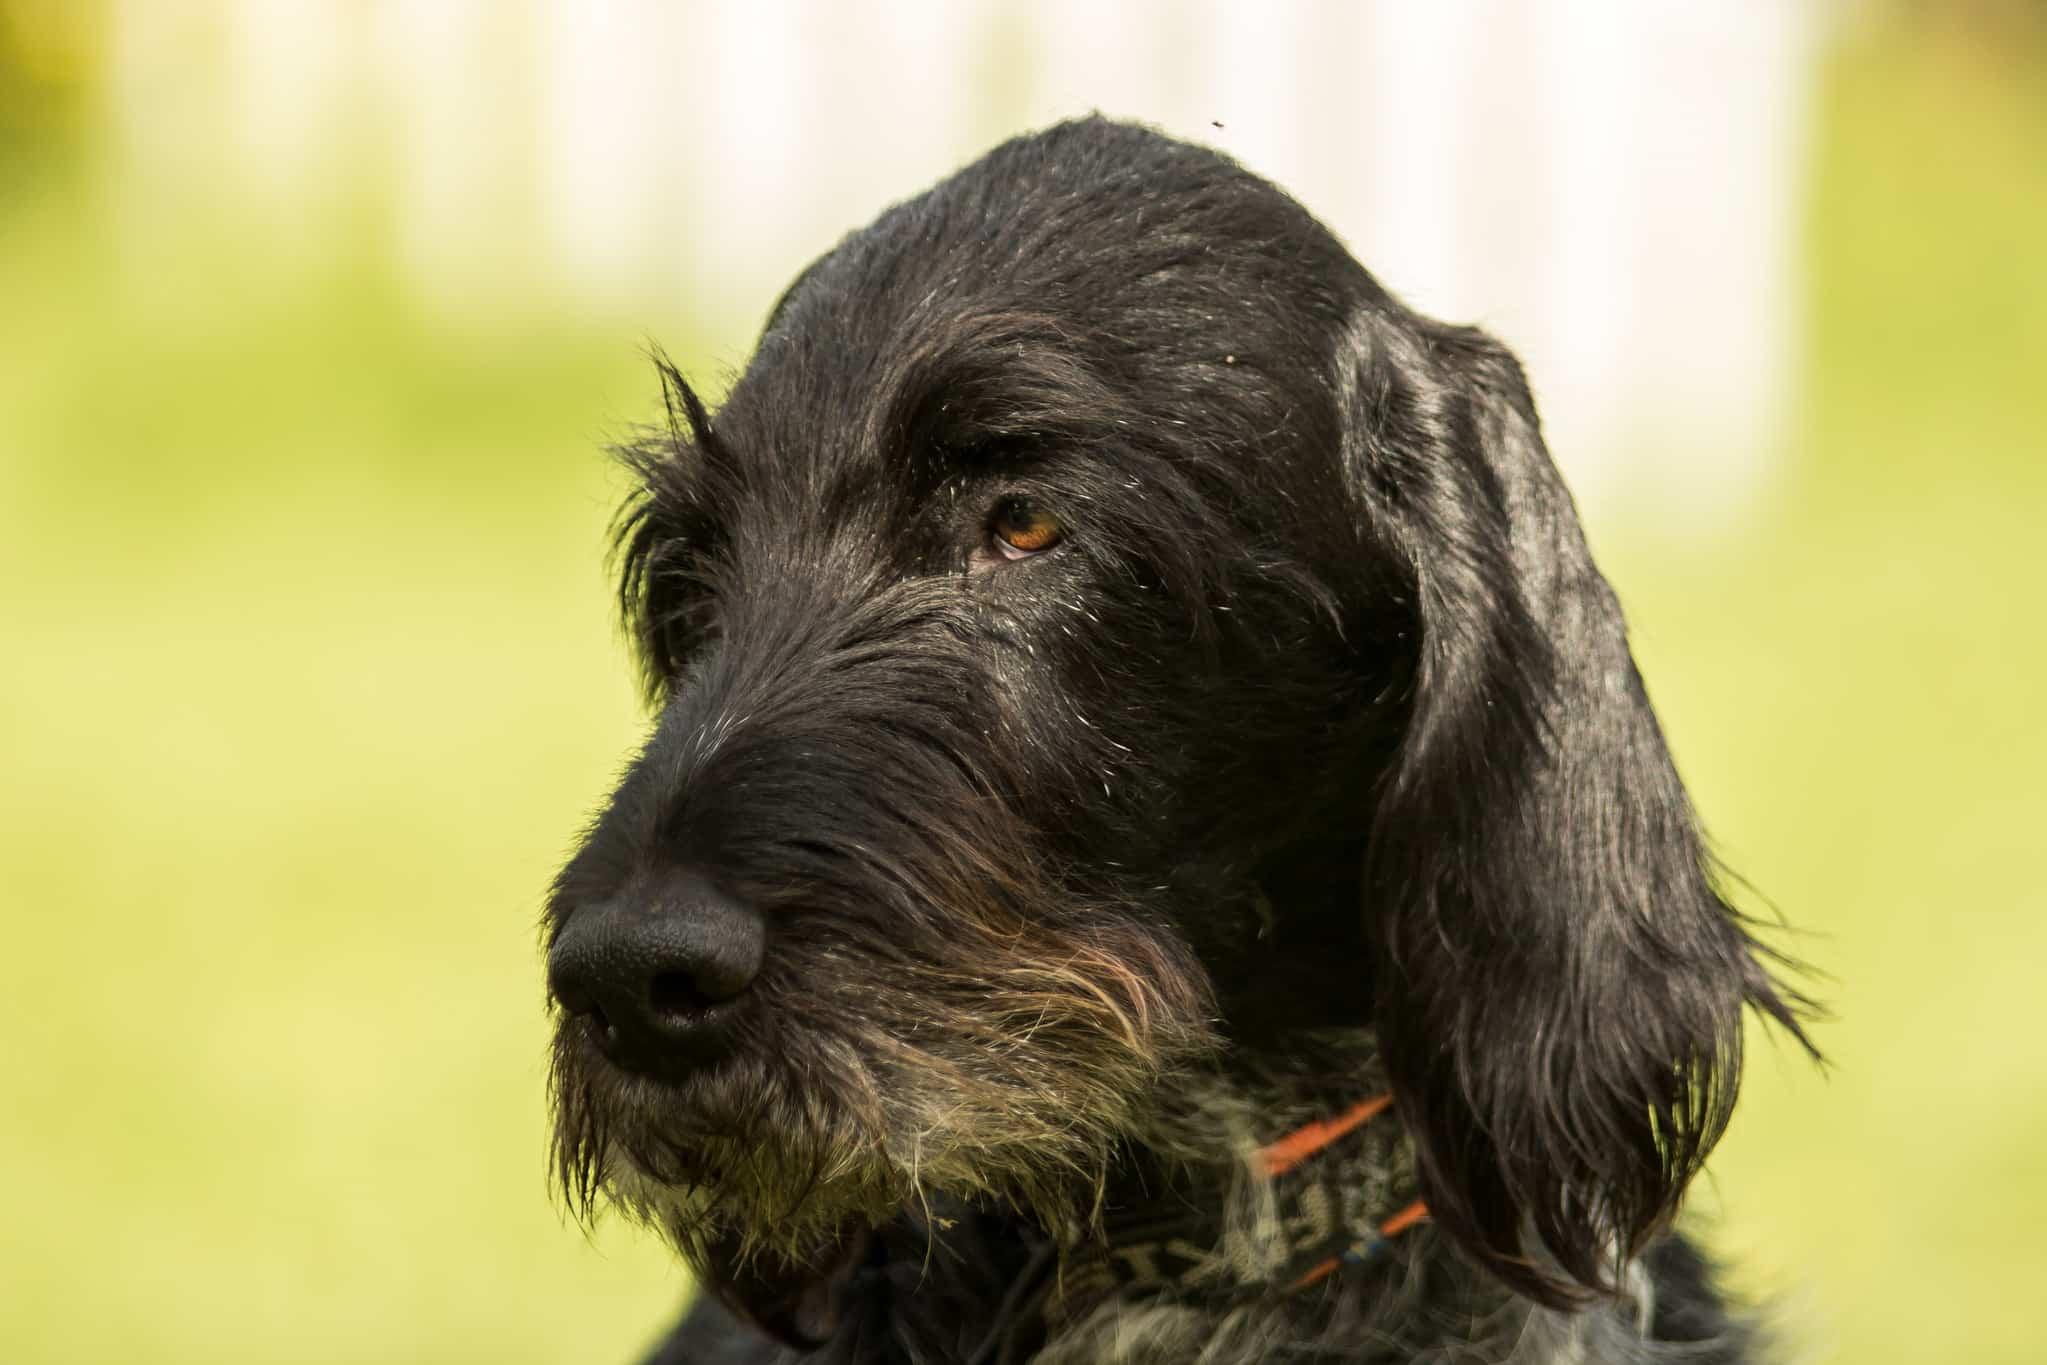 duitse staande hondenras